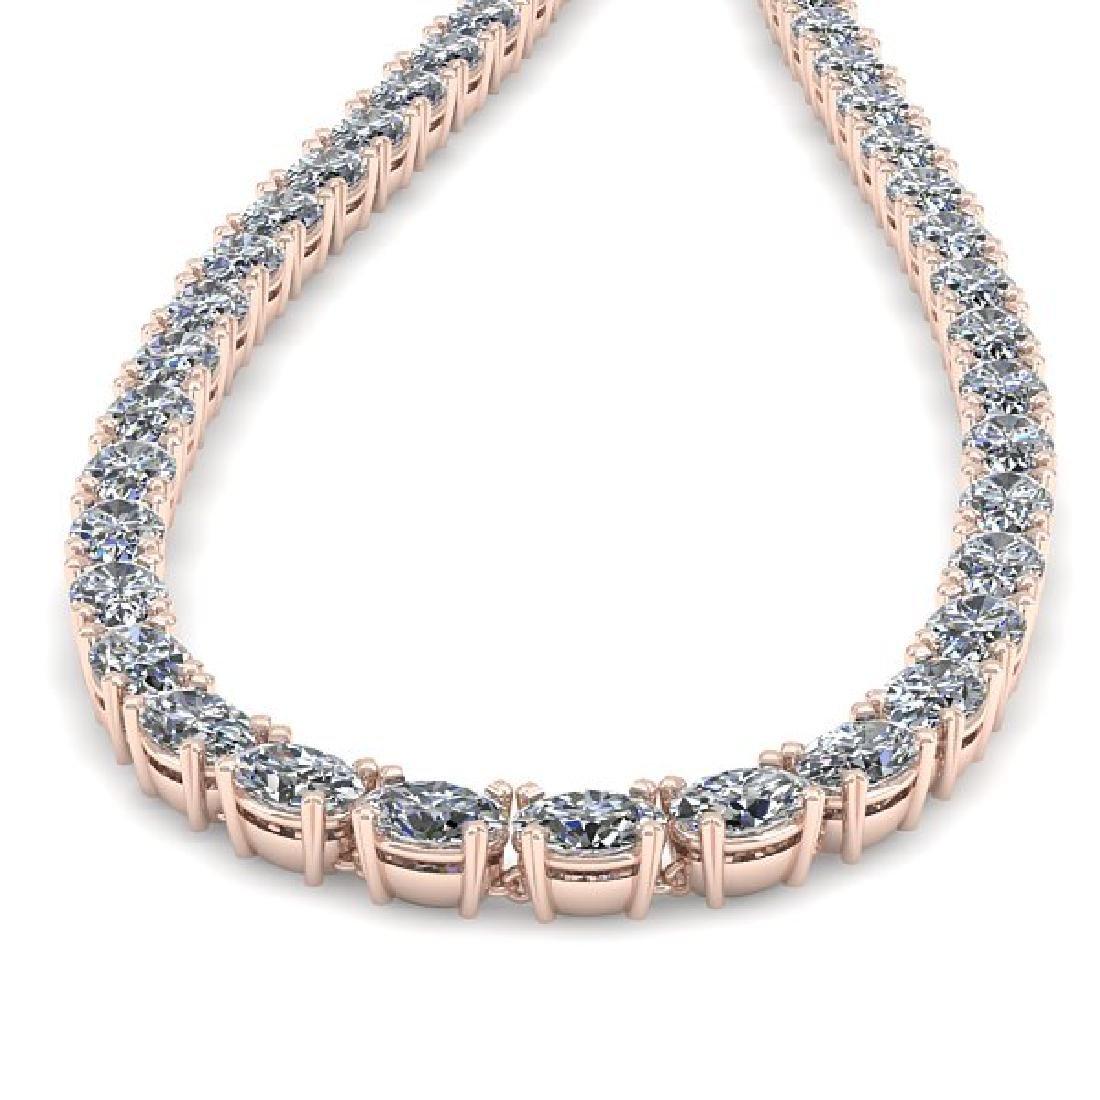 30 CTW Oval Cut Certified SI Diamond Necklace 18K Rose - 2